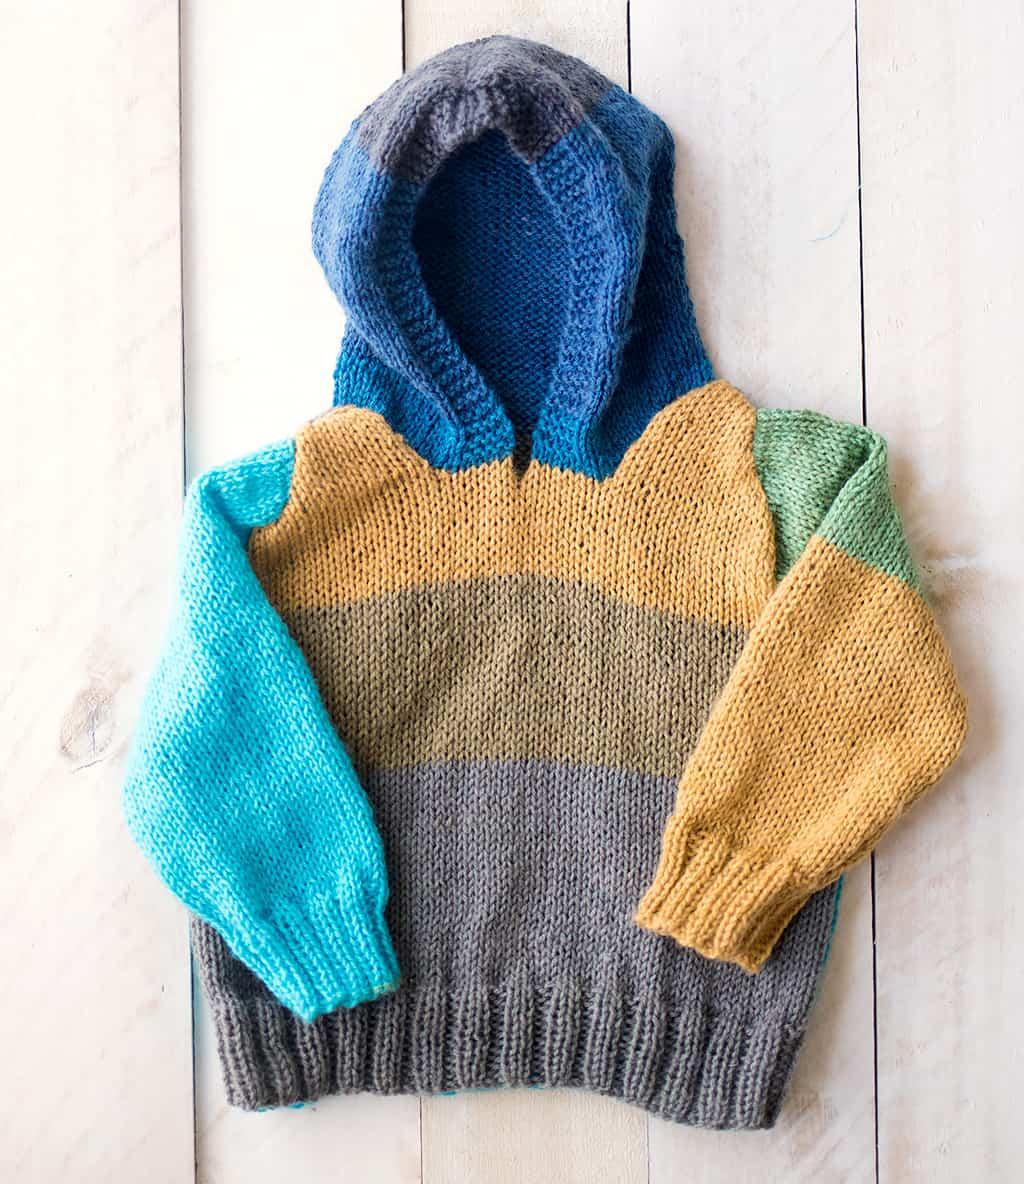 Baby Hooded Sweater Knitting Pattern - Gina Michele